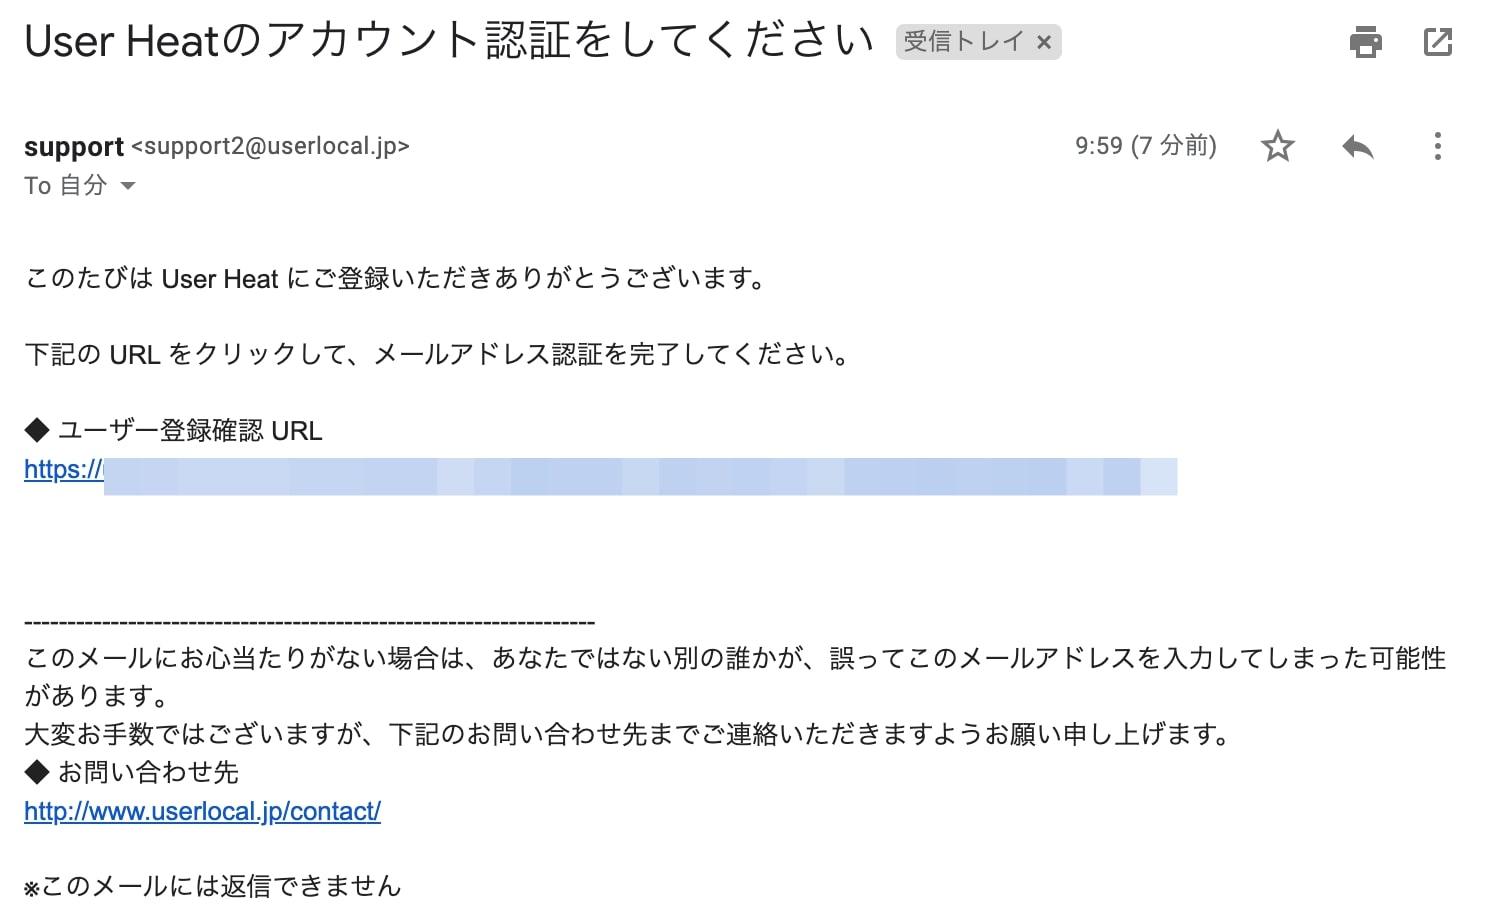 UserHeat